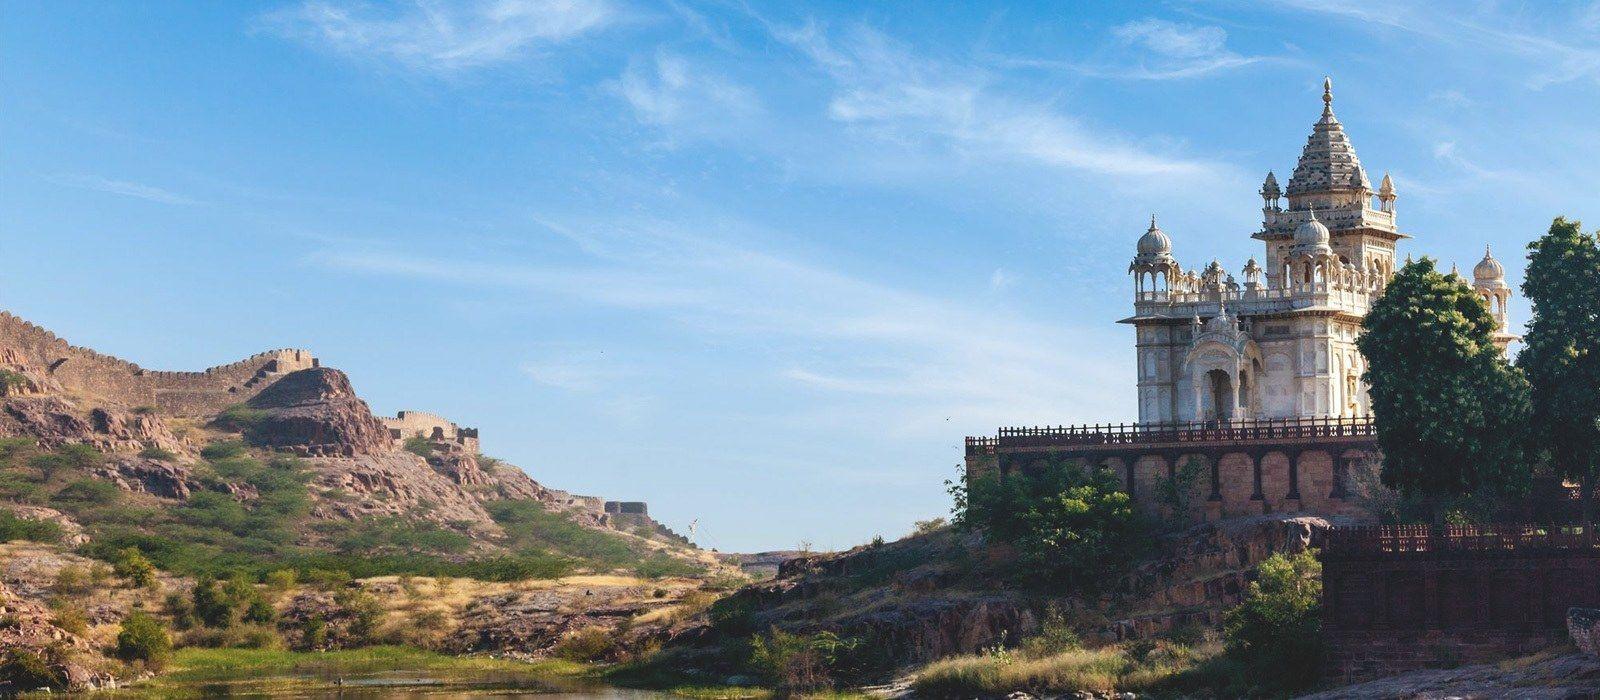 Travel Destination Nord de l'Inde